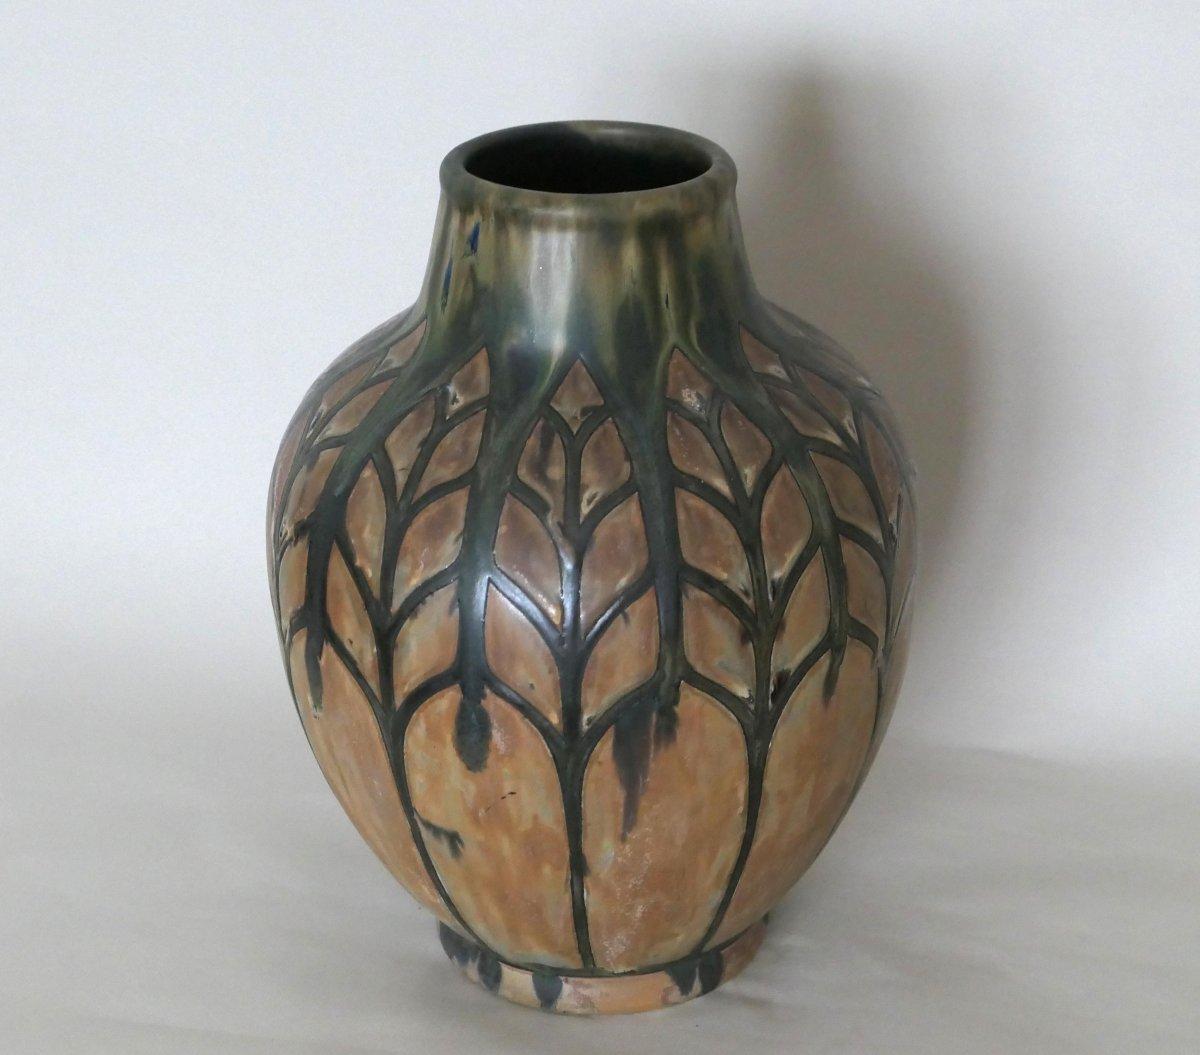 Stoneware Vase - Charles Catteau - Africanist Decor-photo-1